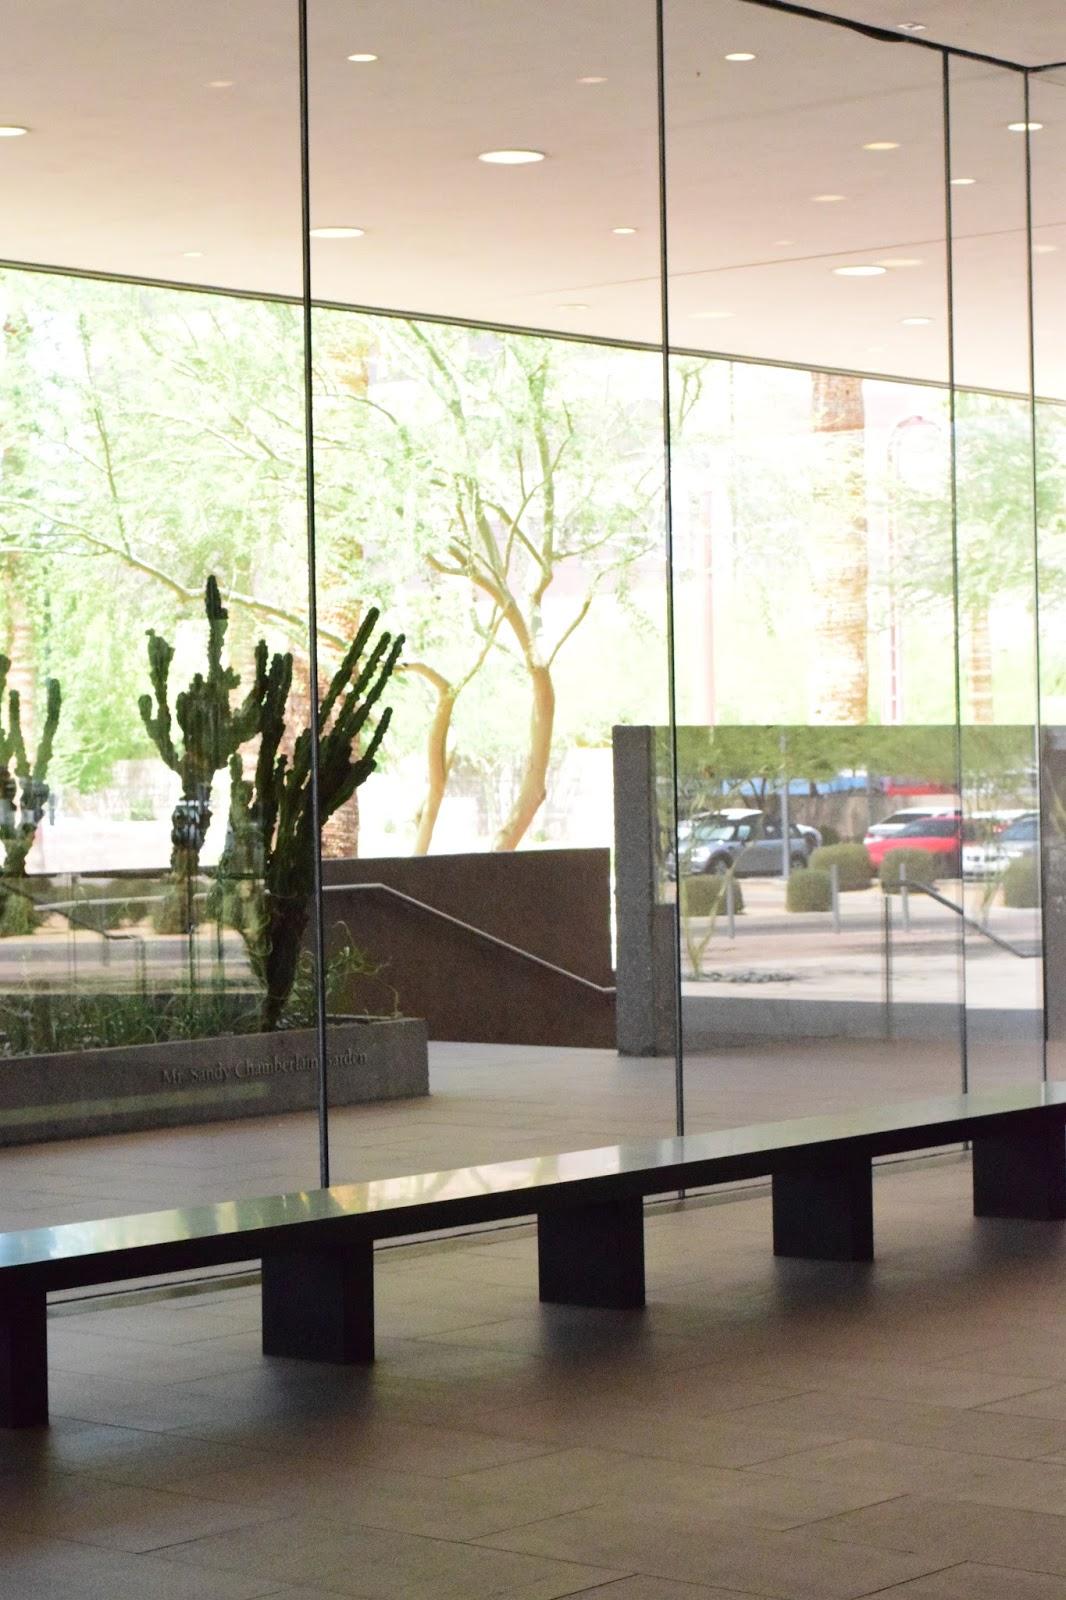 Ana Lydia Monaco : Visiting the Phoenix Art Museum